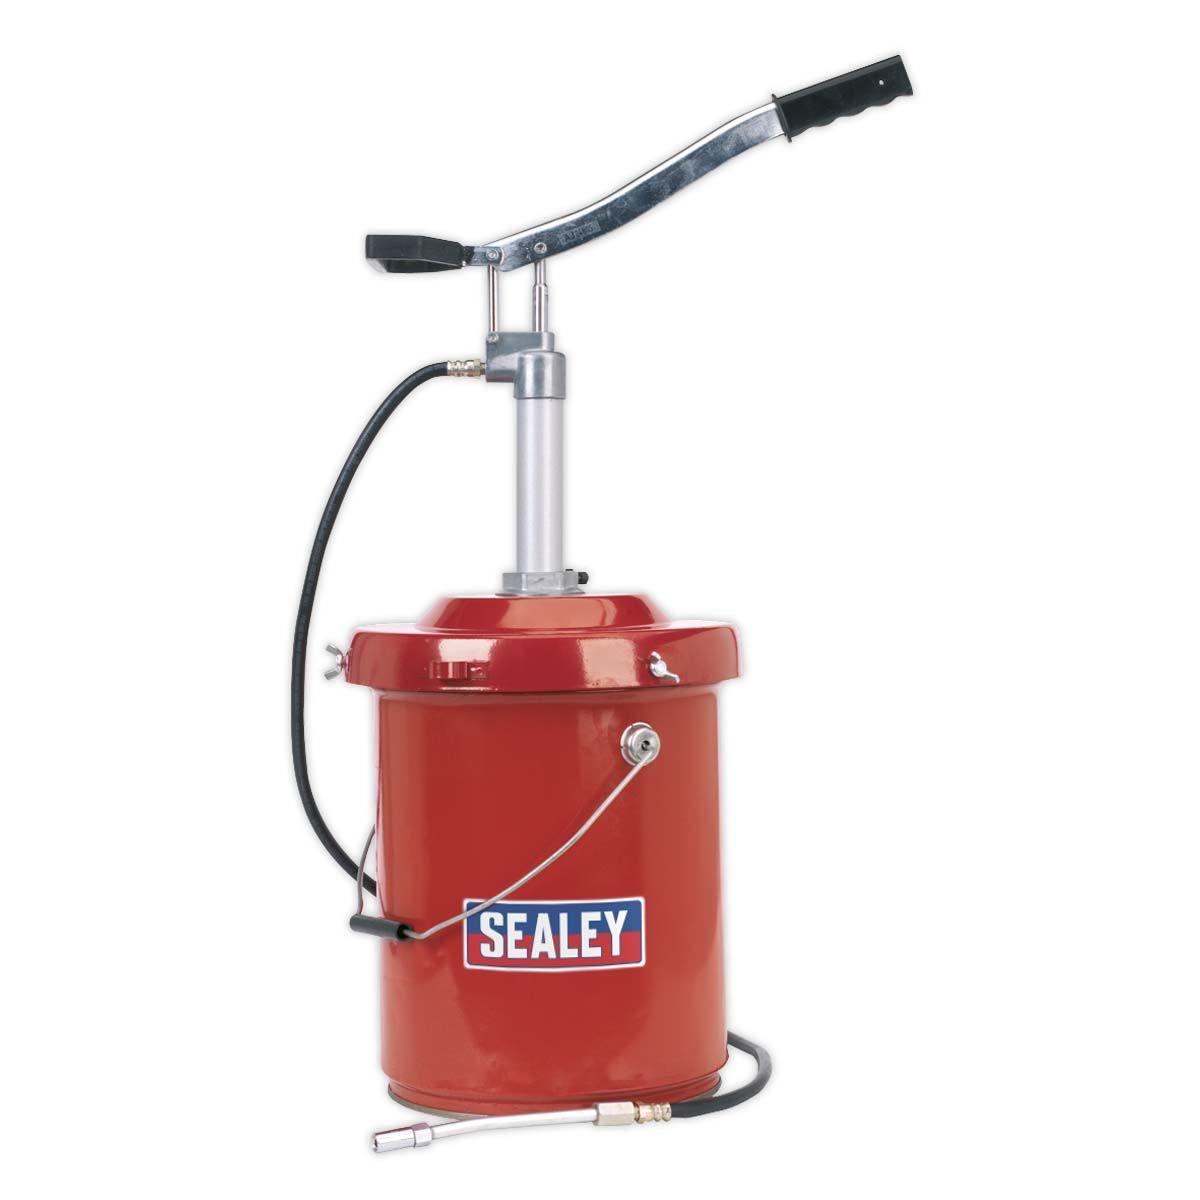 Sealey Bucket Greaser with Follower Plate 12.5kg Heavy-Duty